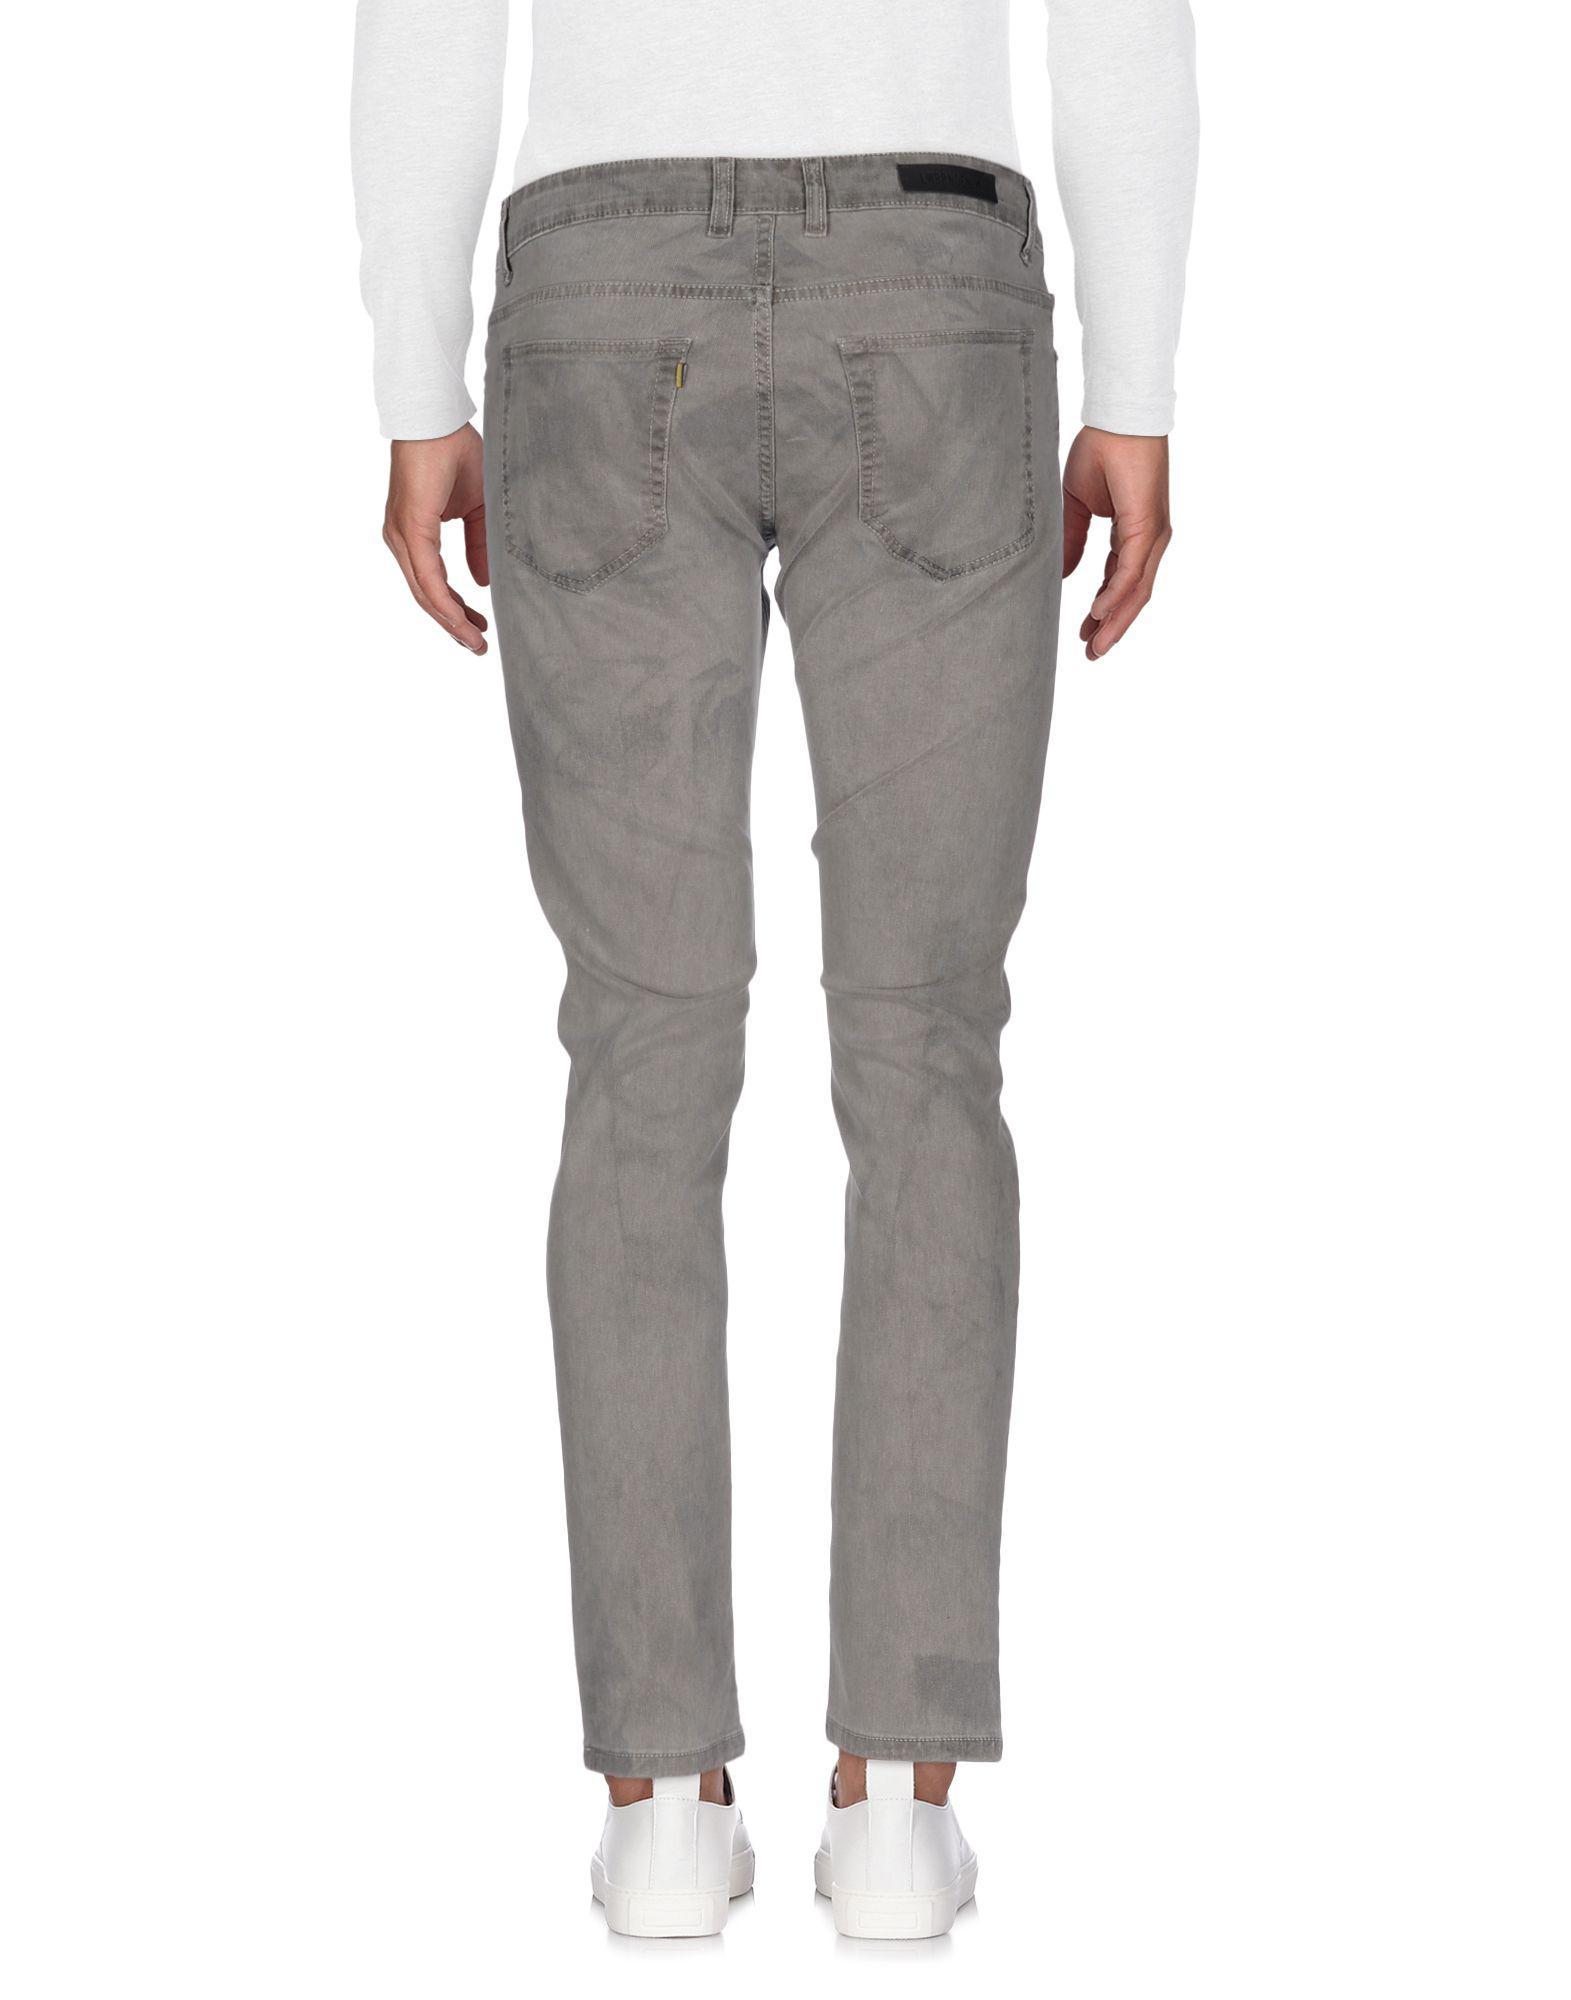 Low Brand Denim Trousers in Light Grey (Grey) for Men